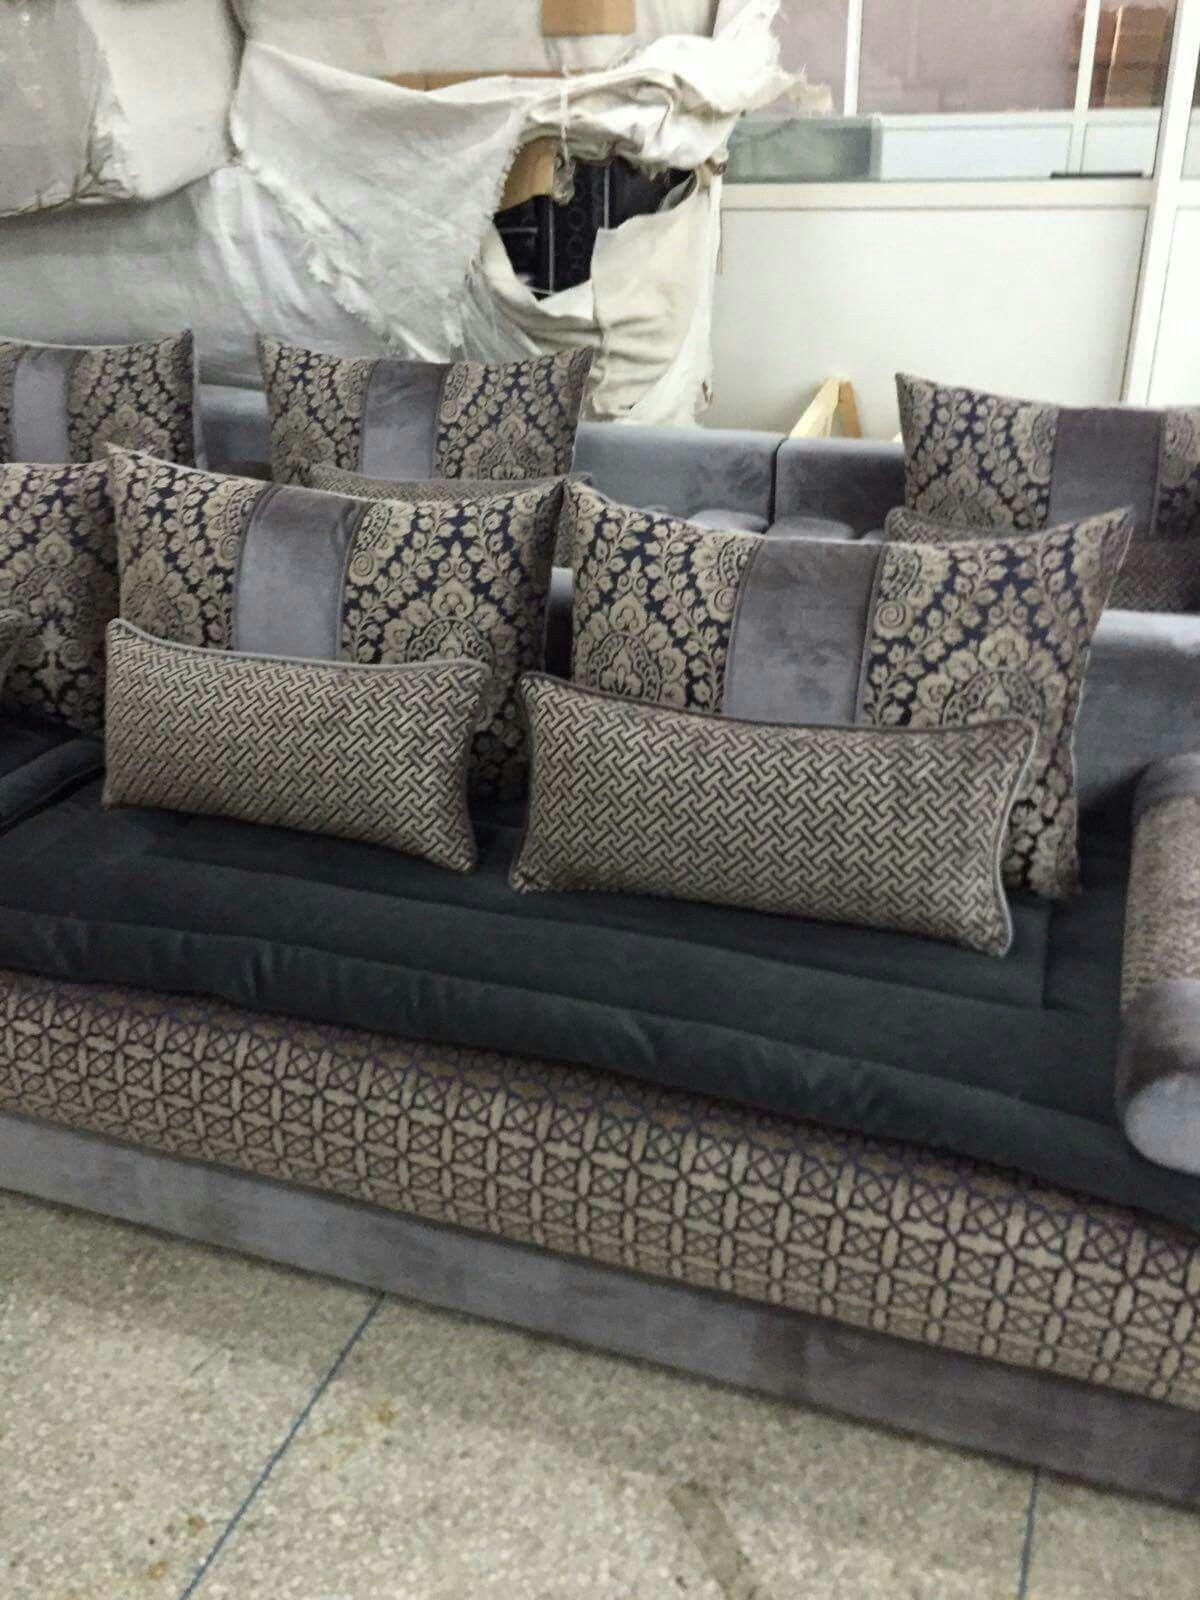 Épinglé par khadija sur Deco | Pinterest | Living room decor, Room ...